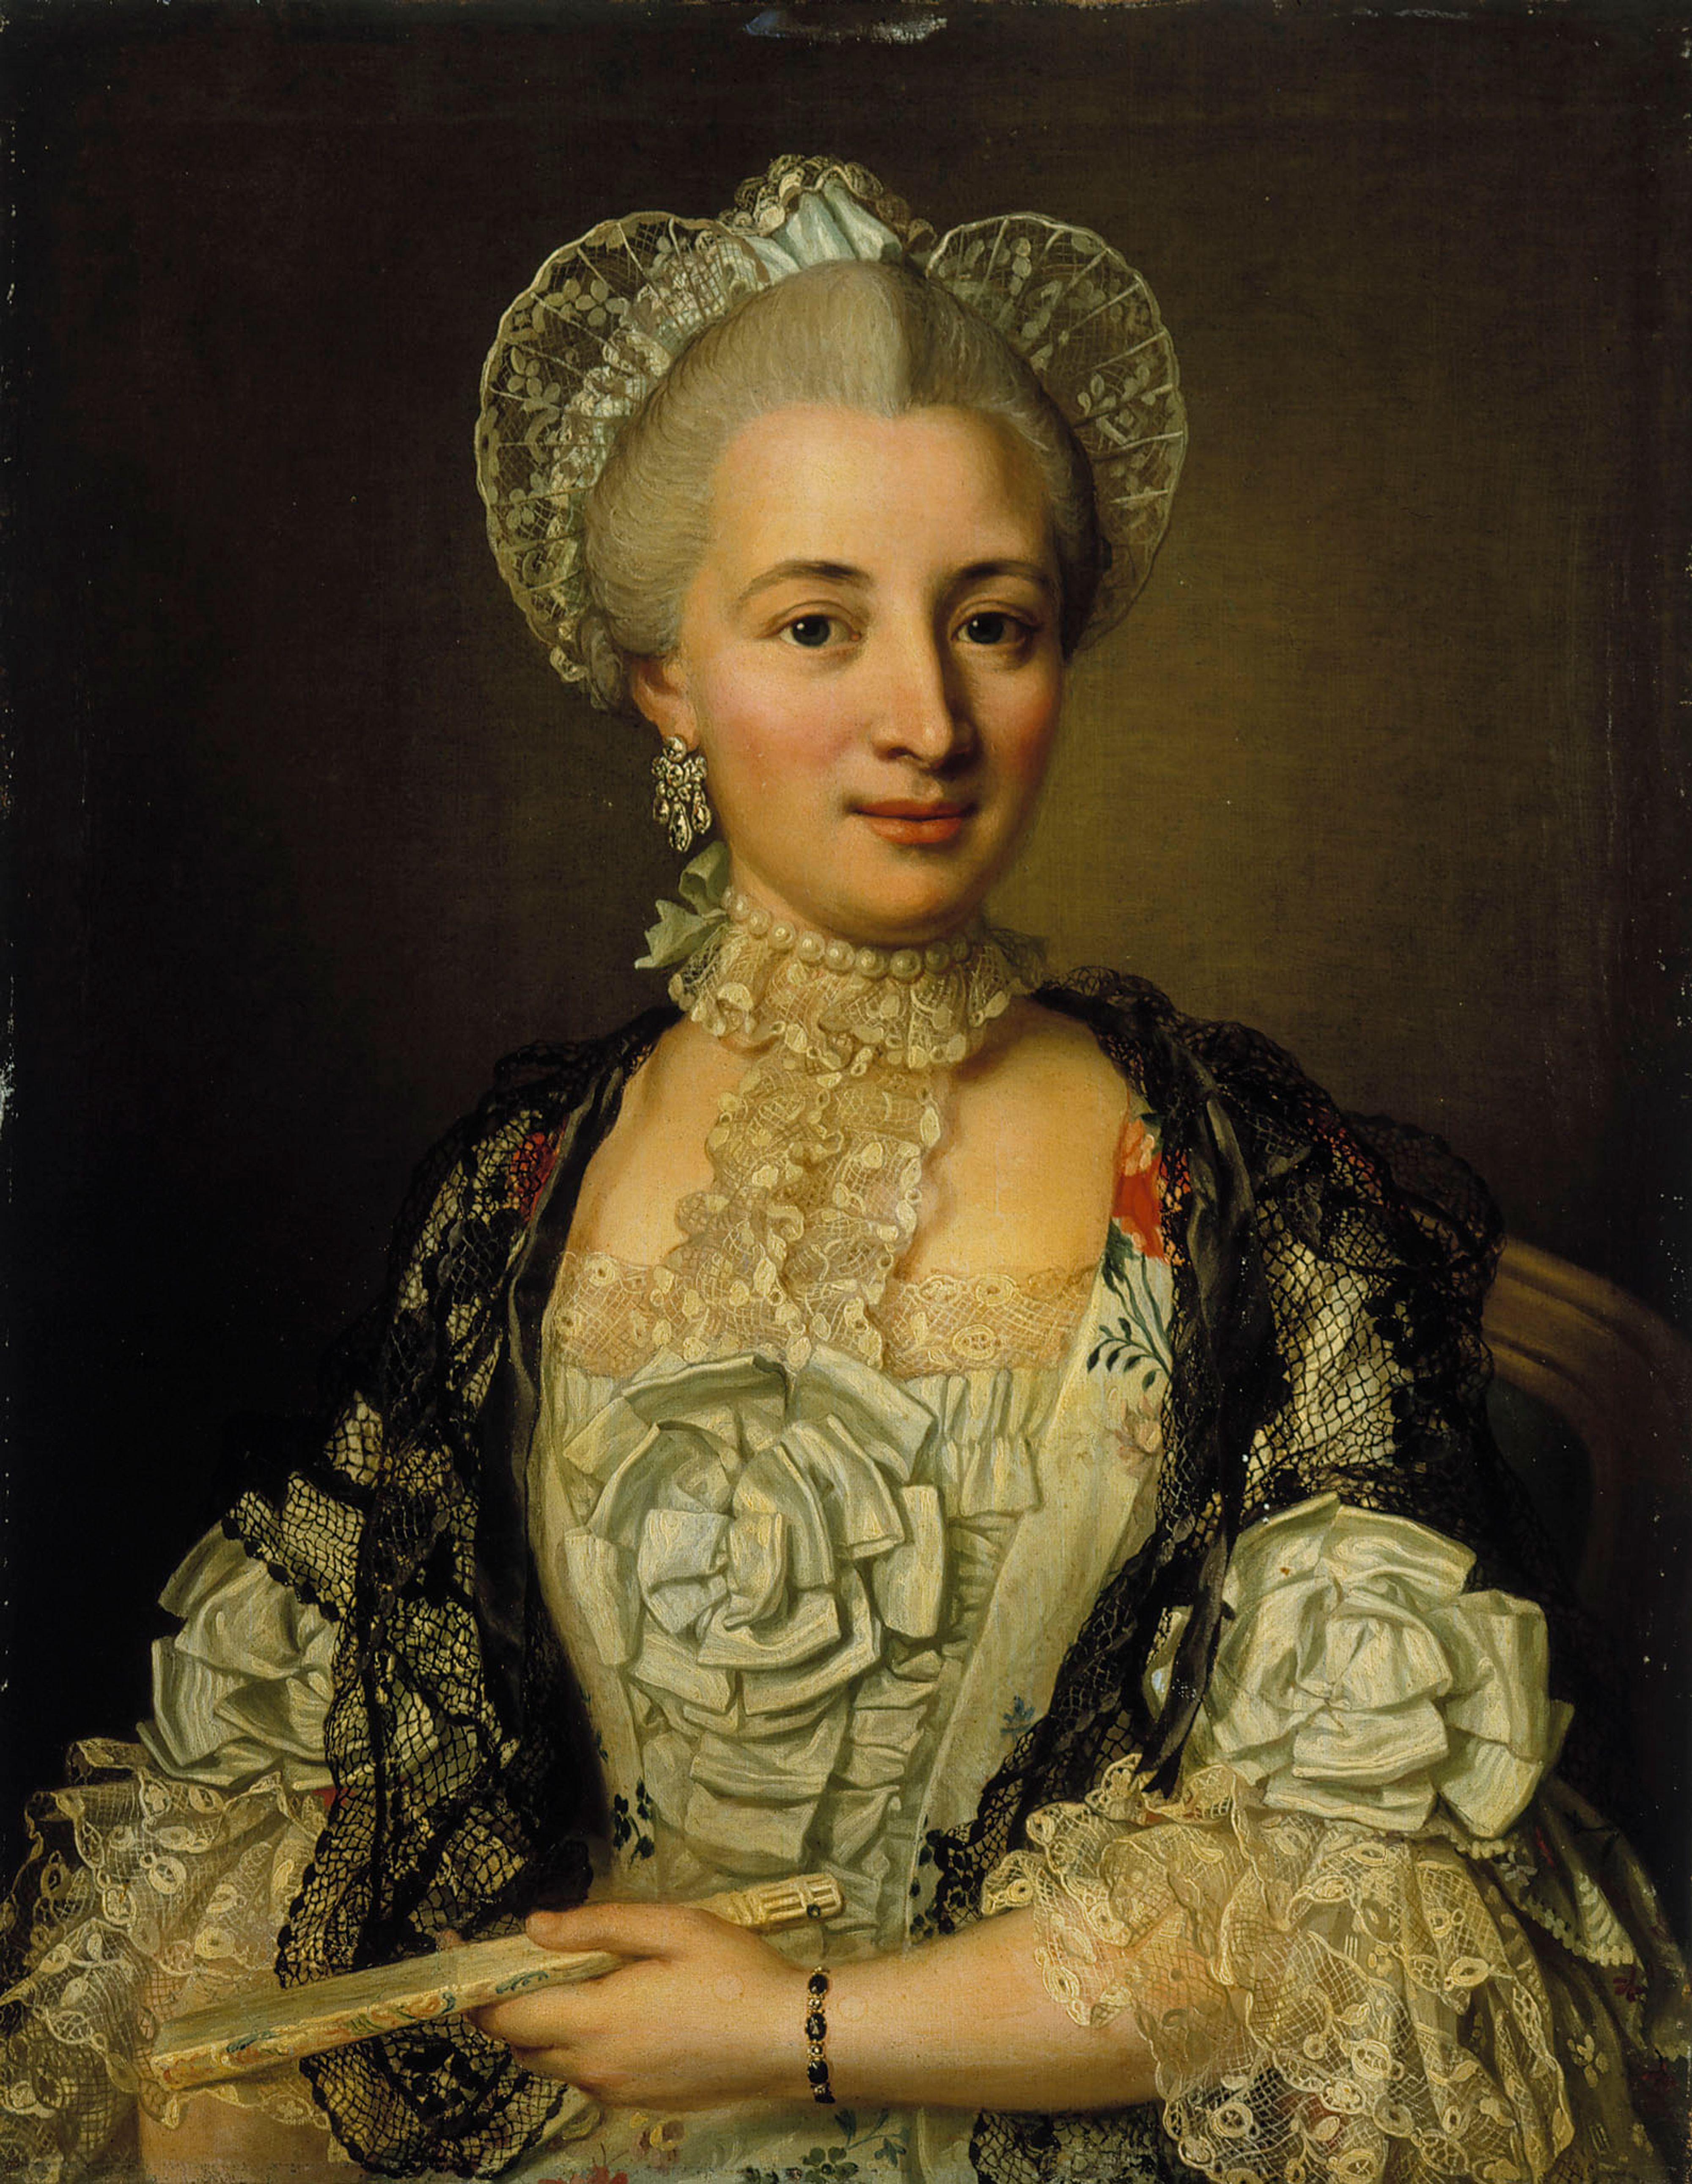 https://upload.wikimedia.org/wikipedia/commons/1/15/Ulrica_Fredrica_Pasch_-_Portrait_of_a_Lady_-_S_109_-_Finnish_National_Gallery.jpg